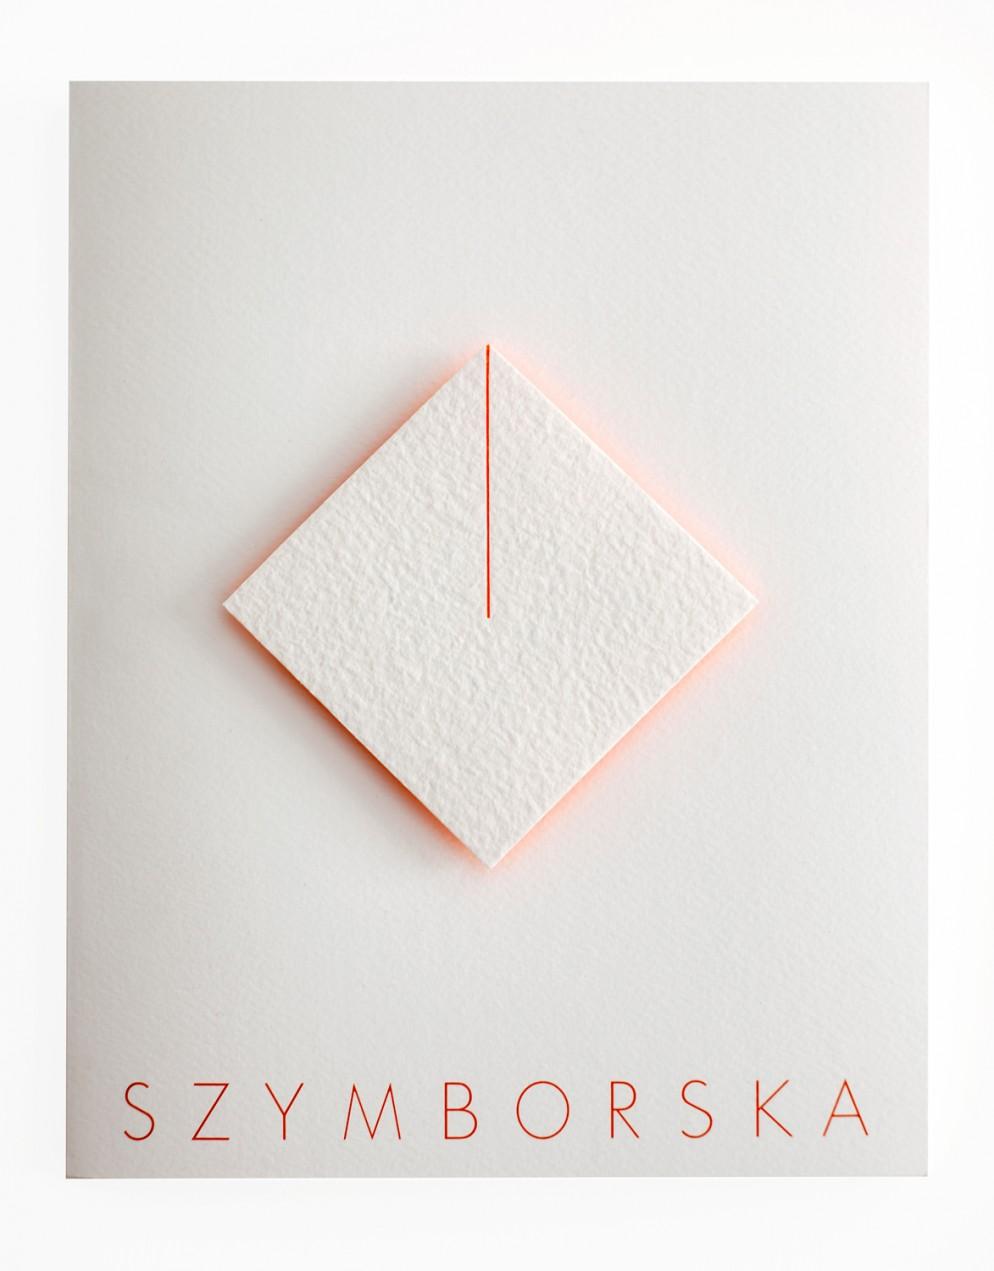 8.-Szymborska,-Dodici-poesie-copertina